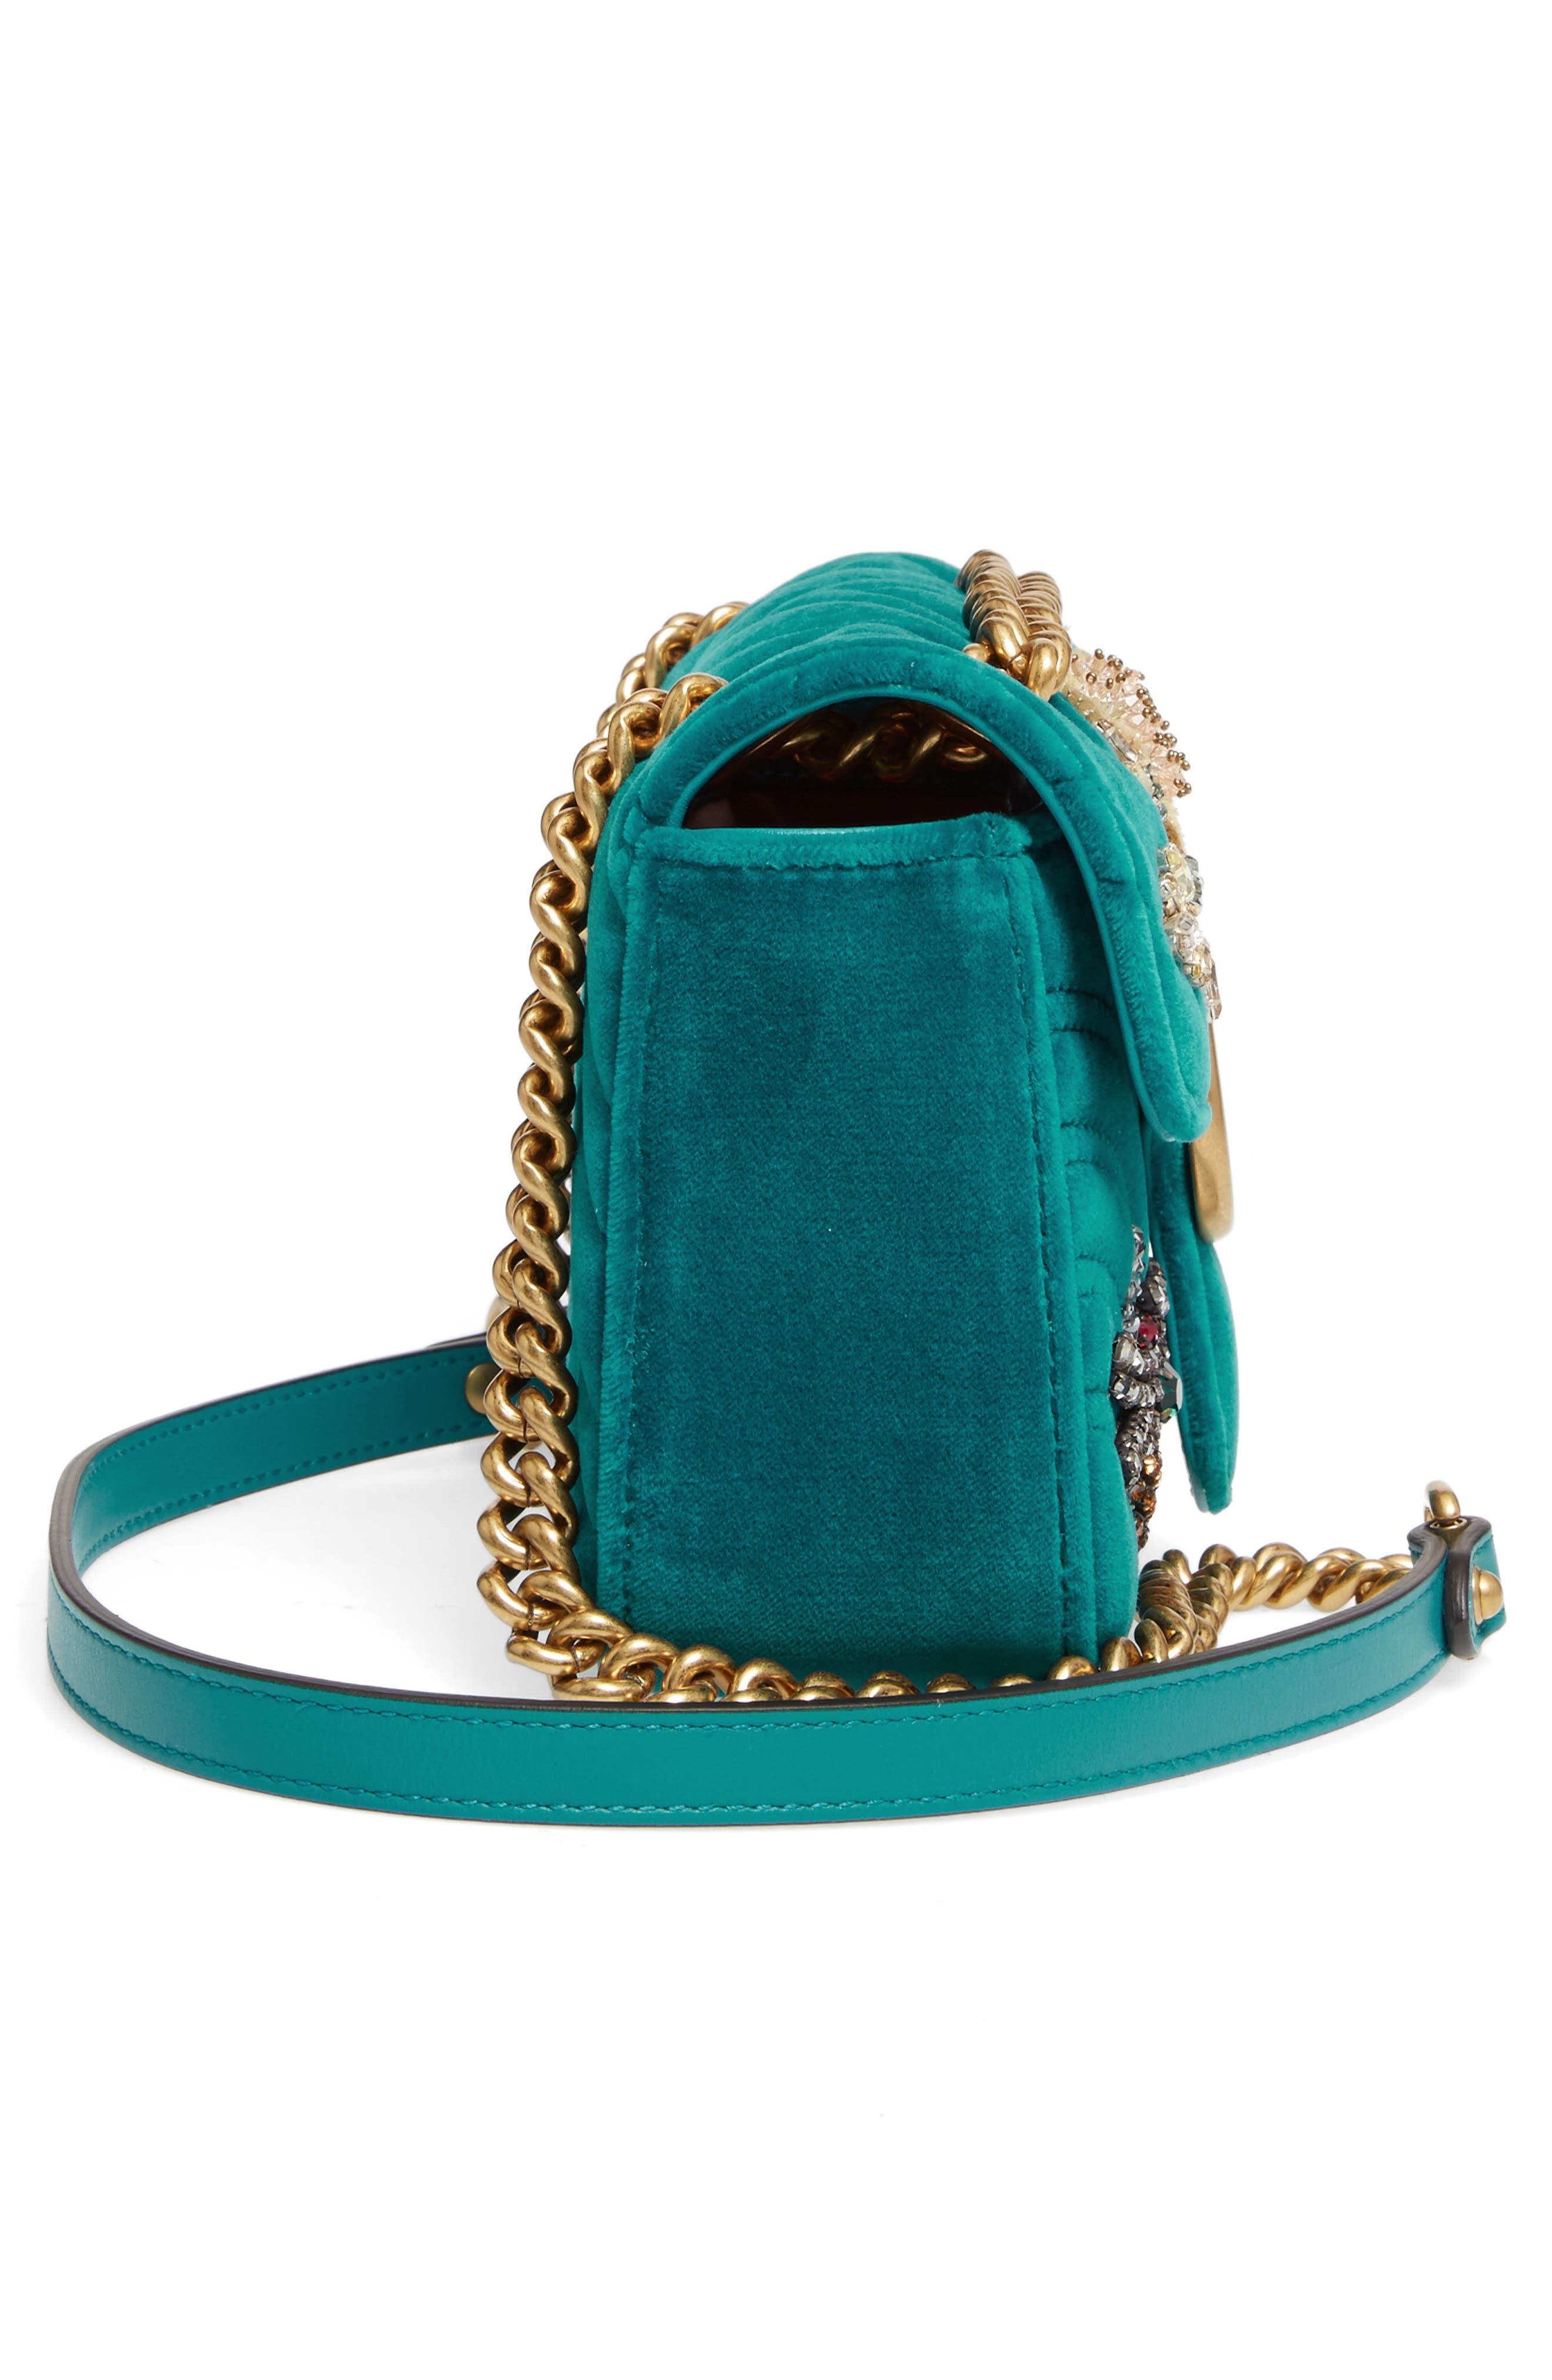 GUCCI, Mini GG Marmont Matelassé Velvet Shoulder Bag, Alternate thumbnail 5, color, PIVONE